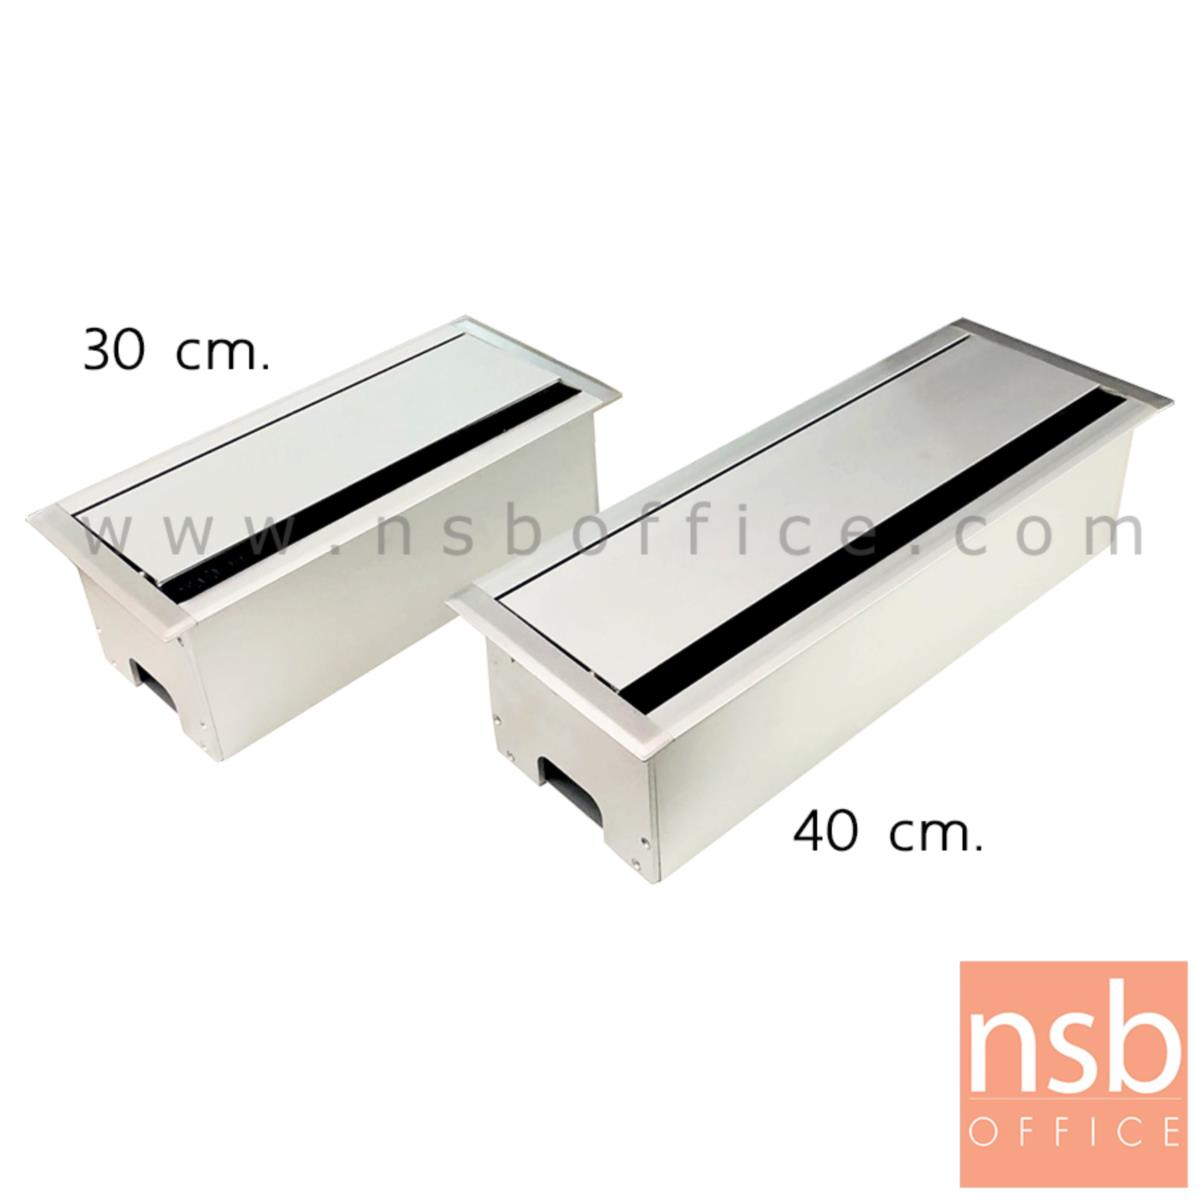 A24A047:กล่องไฟอลูมิเนียม soft close รุ่น AMBER ขนาด 30W ,40W cm.